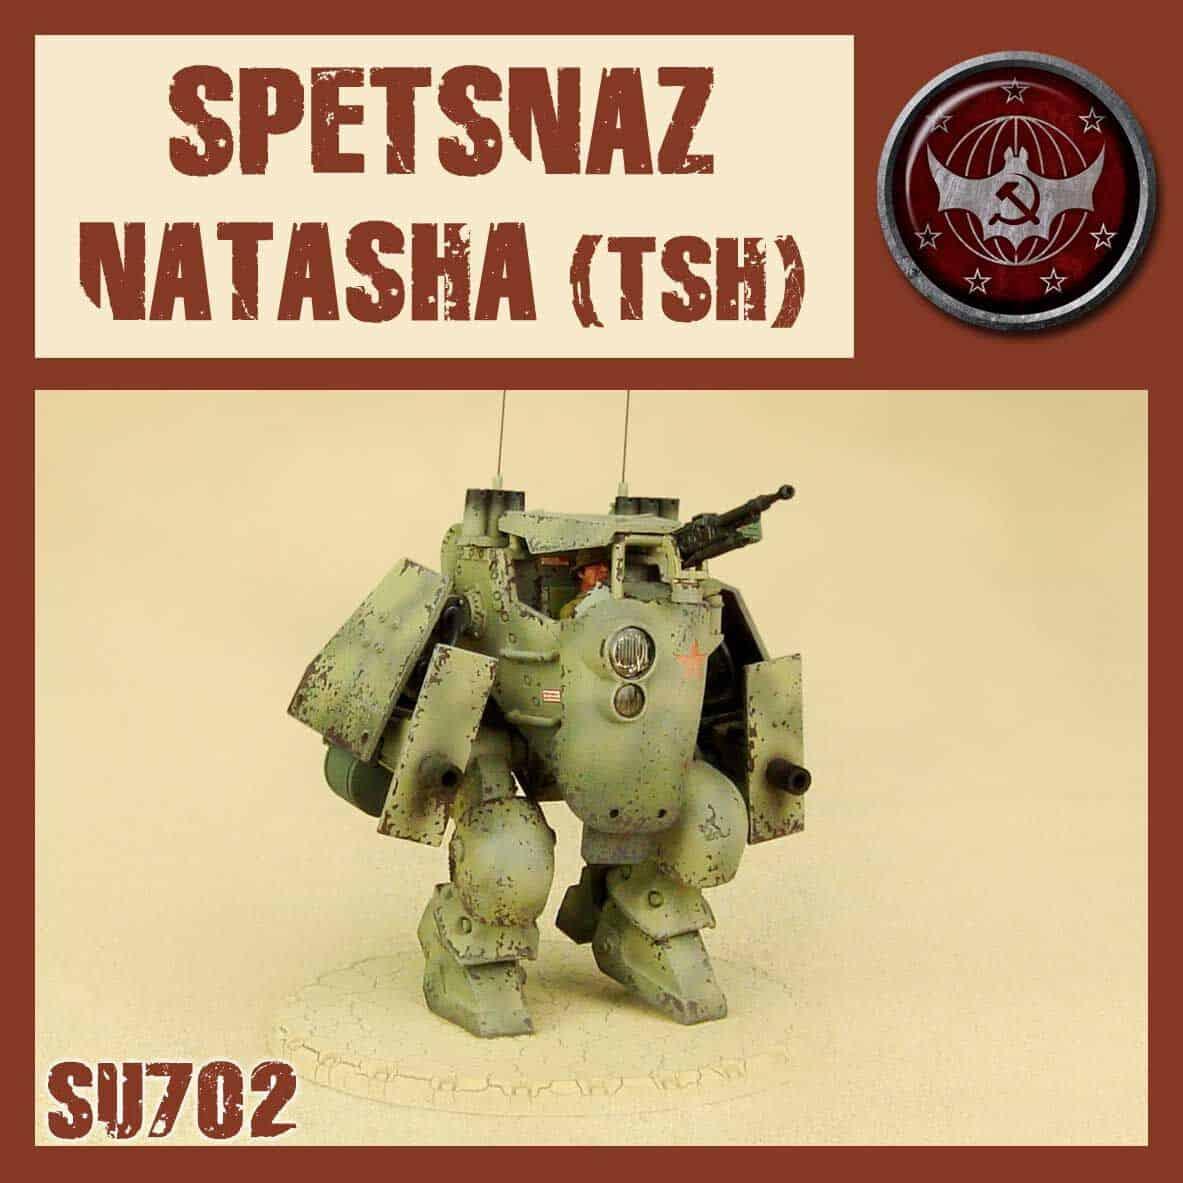 Natasha (TsH)